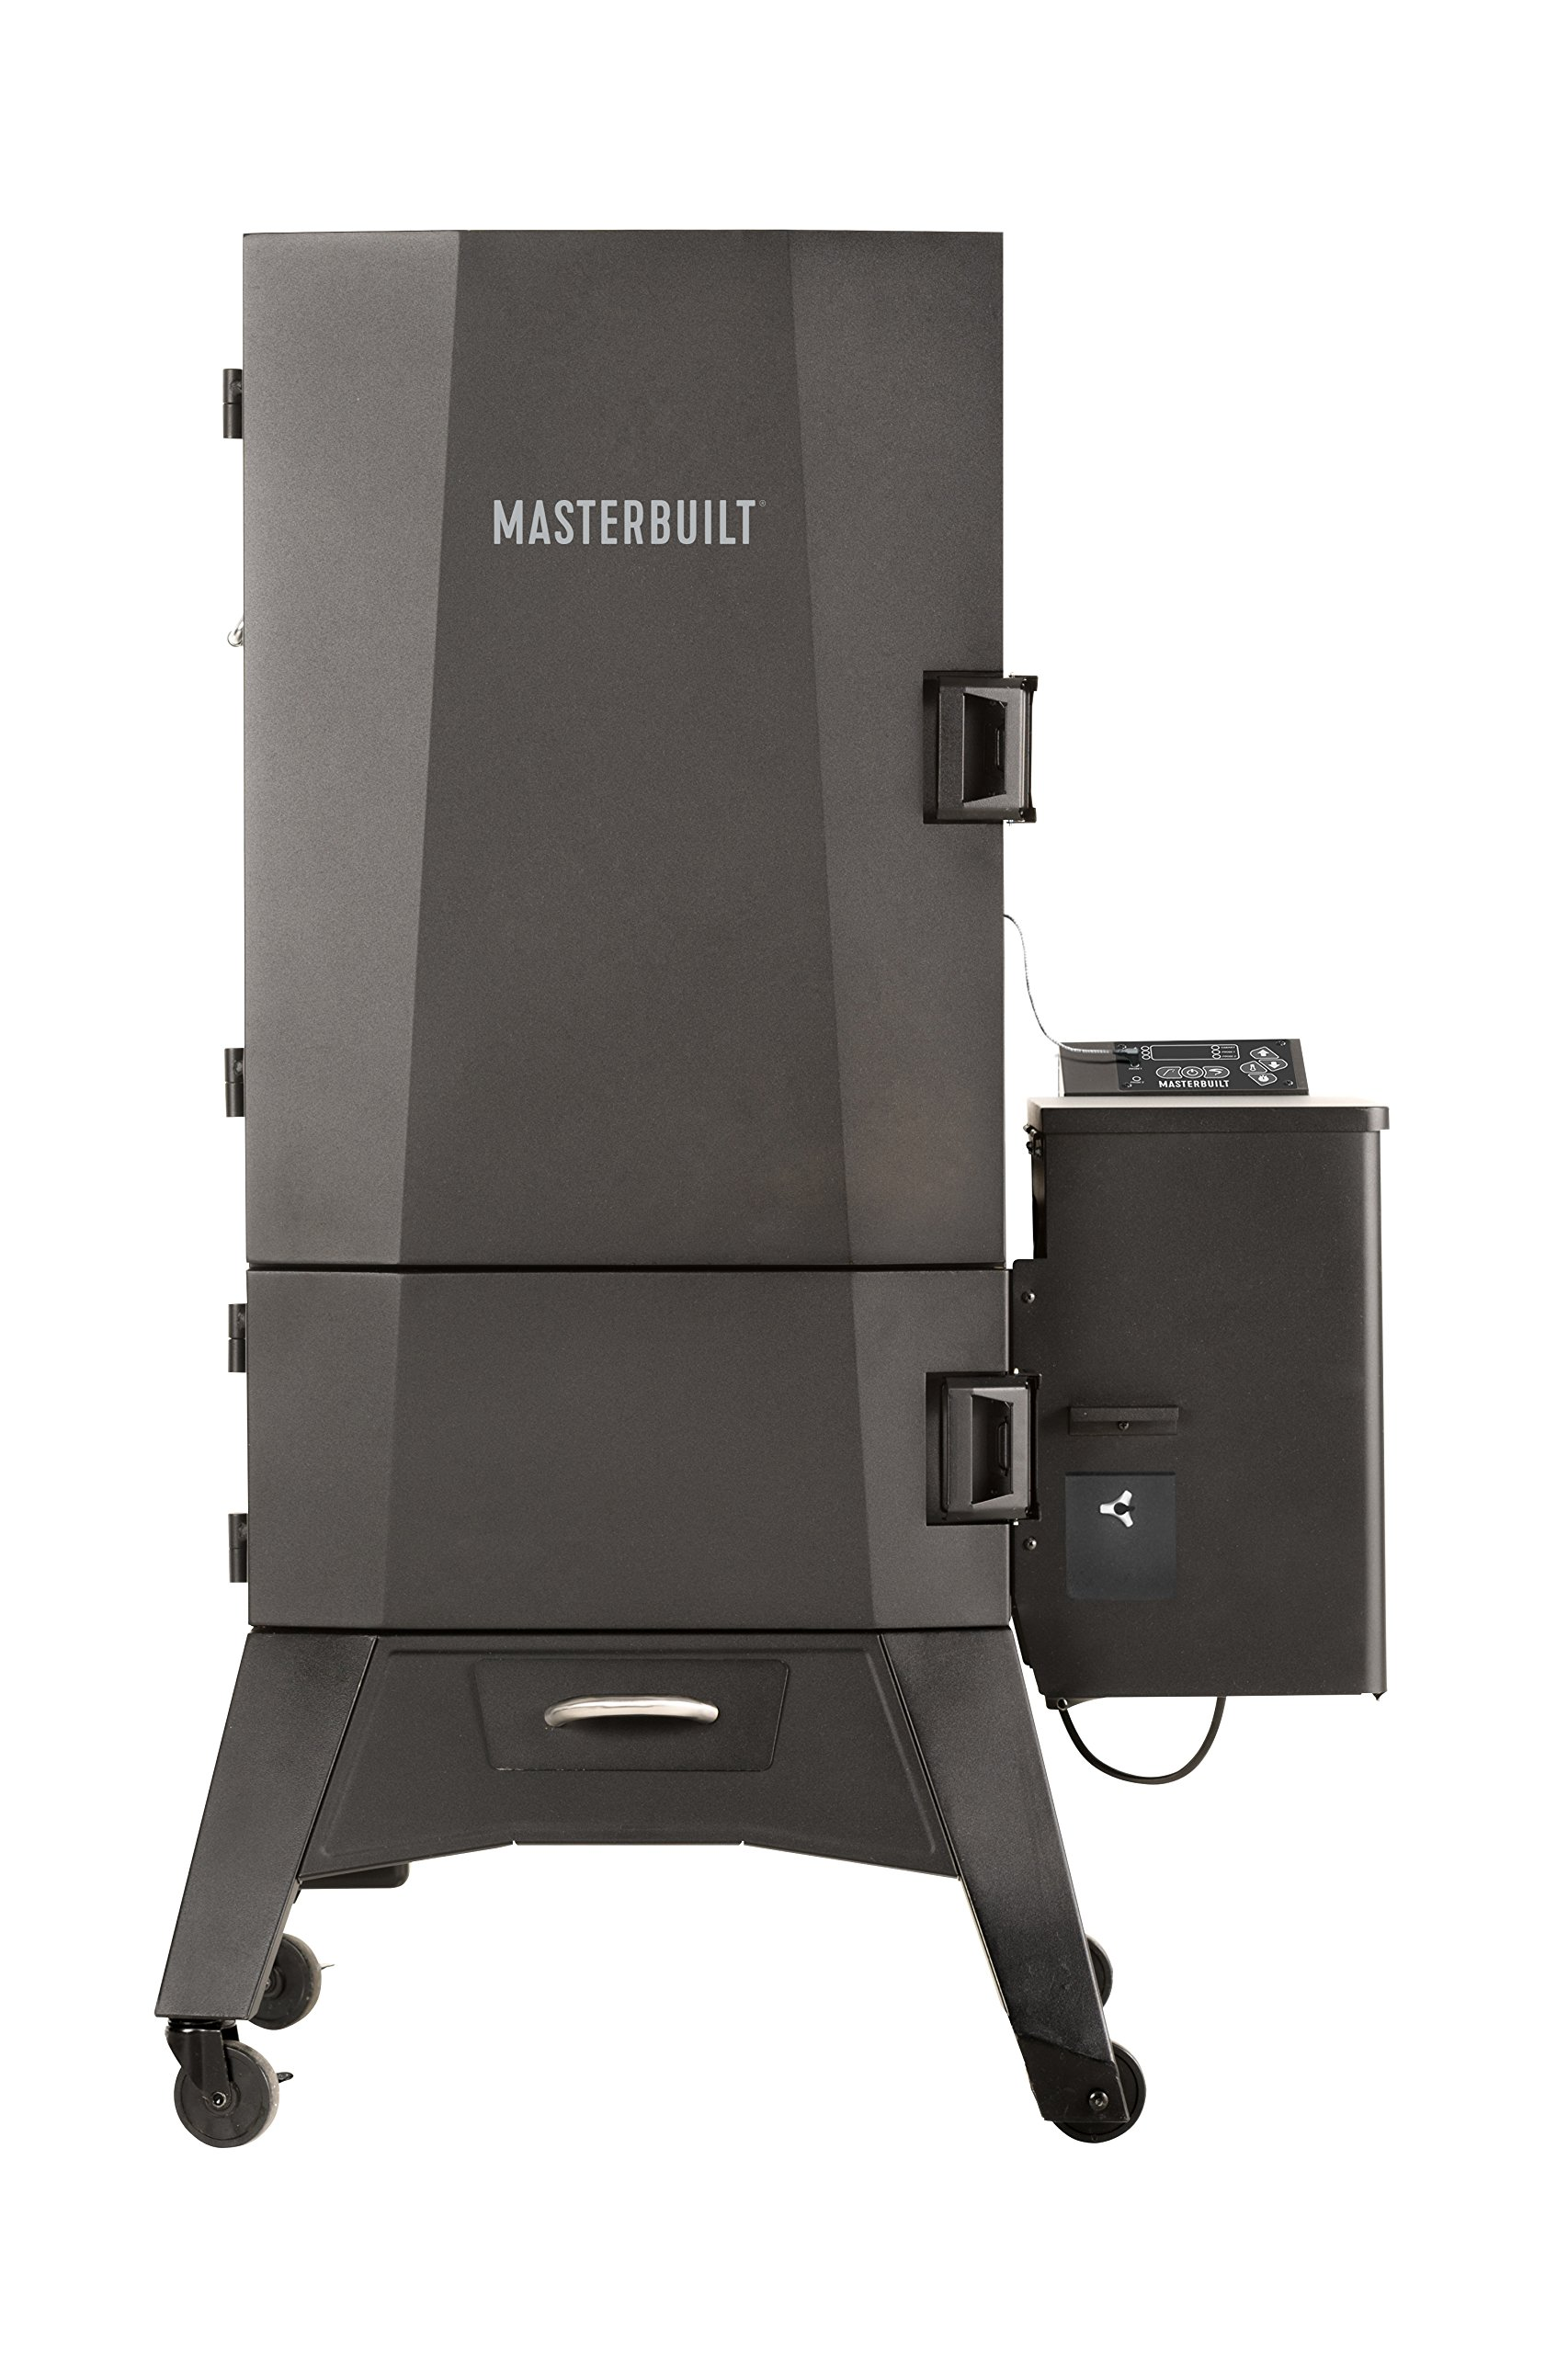 Masterbuilt MB20250218 MWS340B Pellet Smoker, 40 in in, Black by Masterbuilt